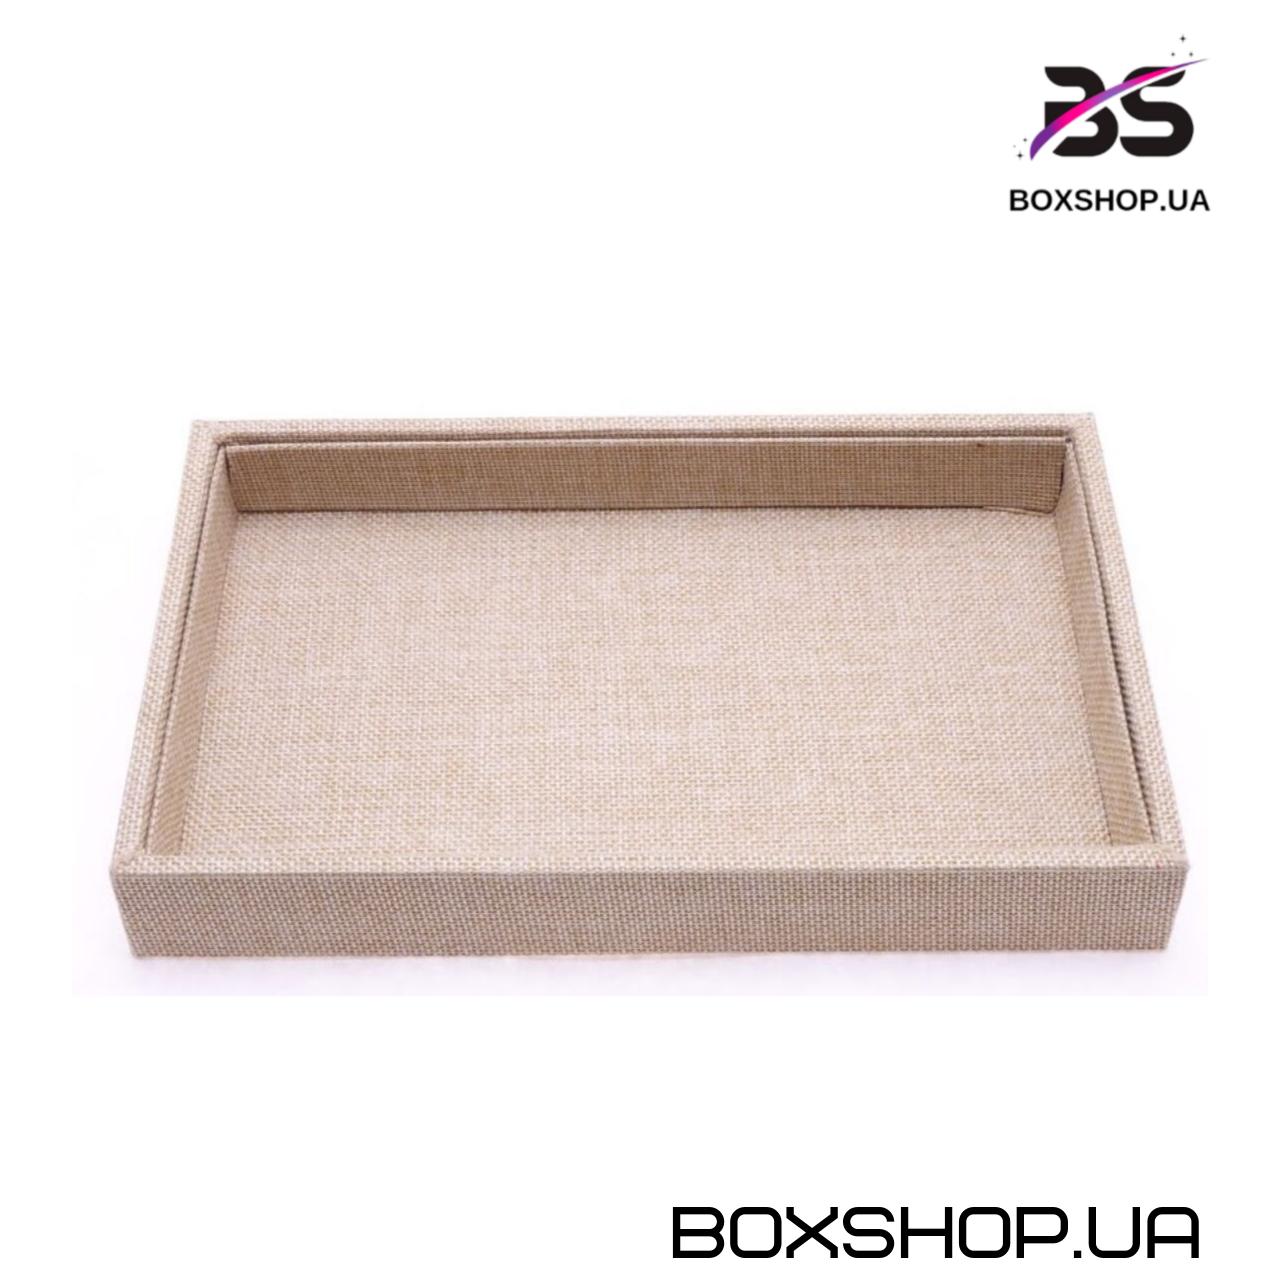 Ювелирный планшет-презентер BOXSHOP - 1022154112